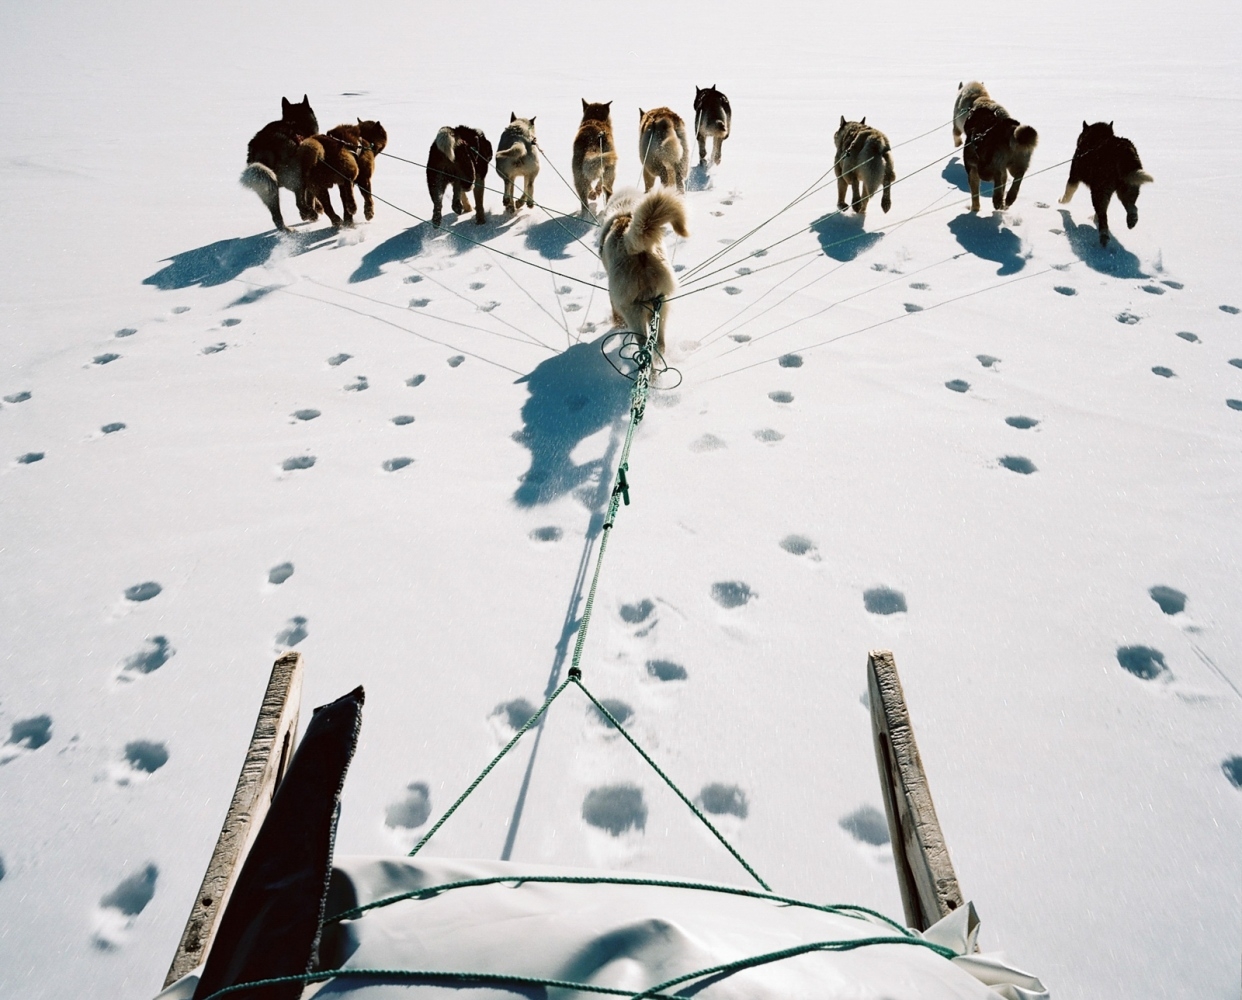 Art and Documentary Photography - Loading 004_Melting_away-.jpg